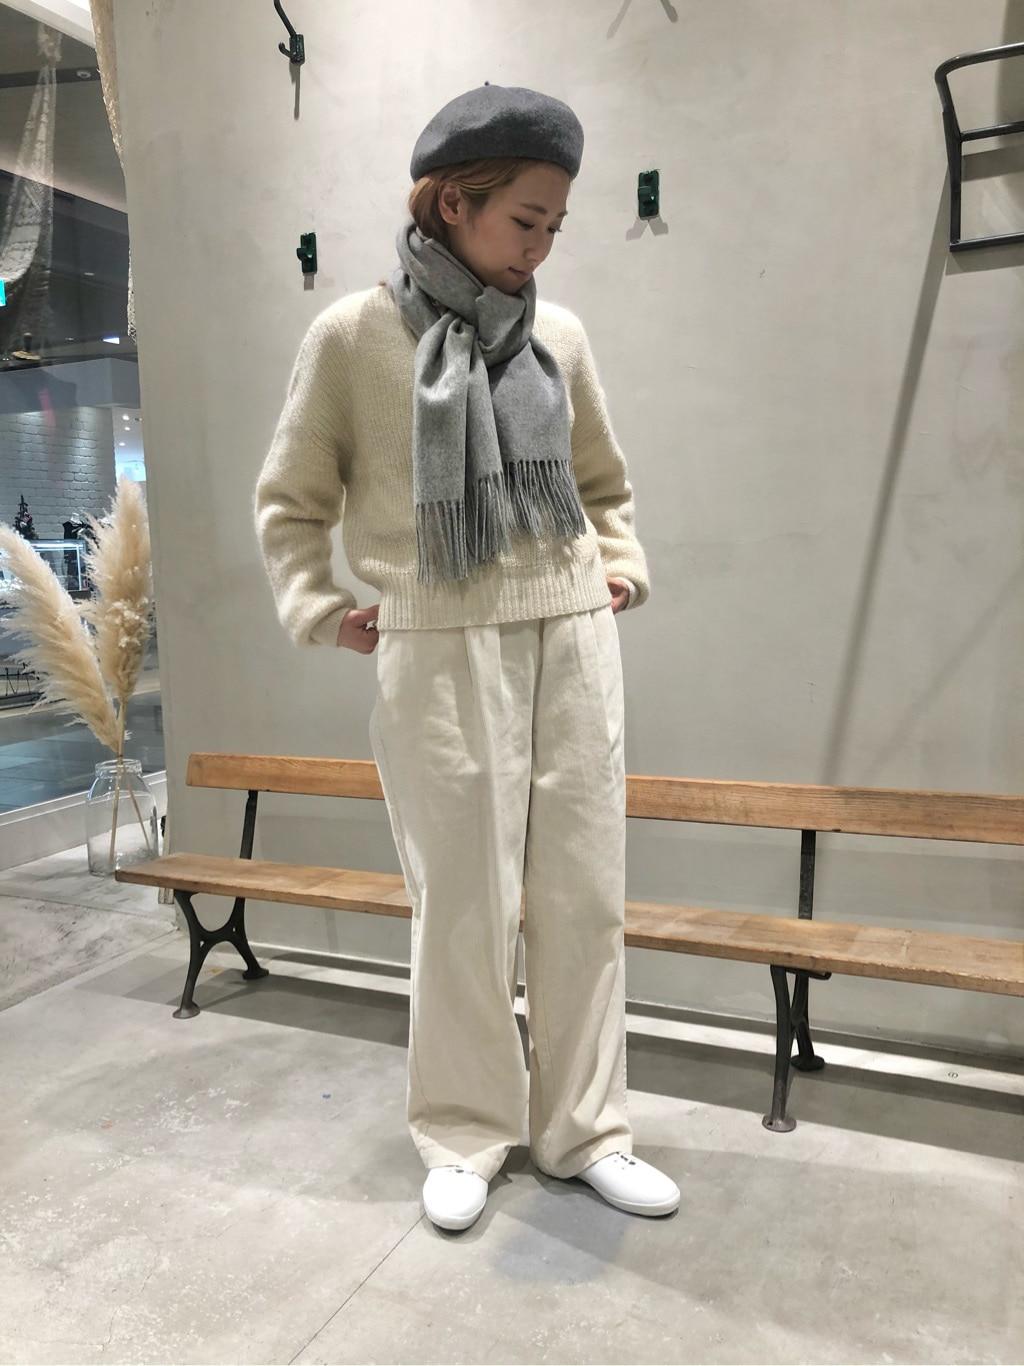 yuni 東急プラザ銀座 身長:154cm 2020.11.19